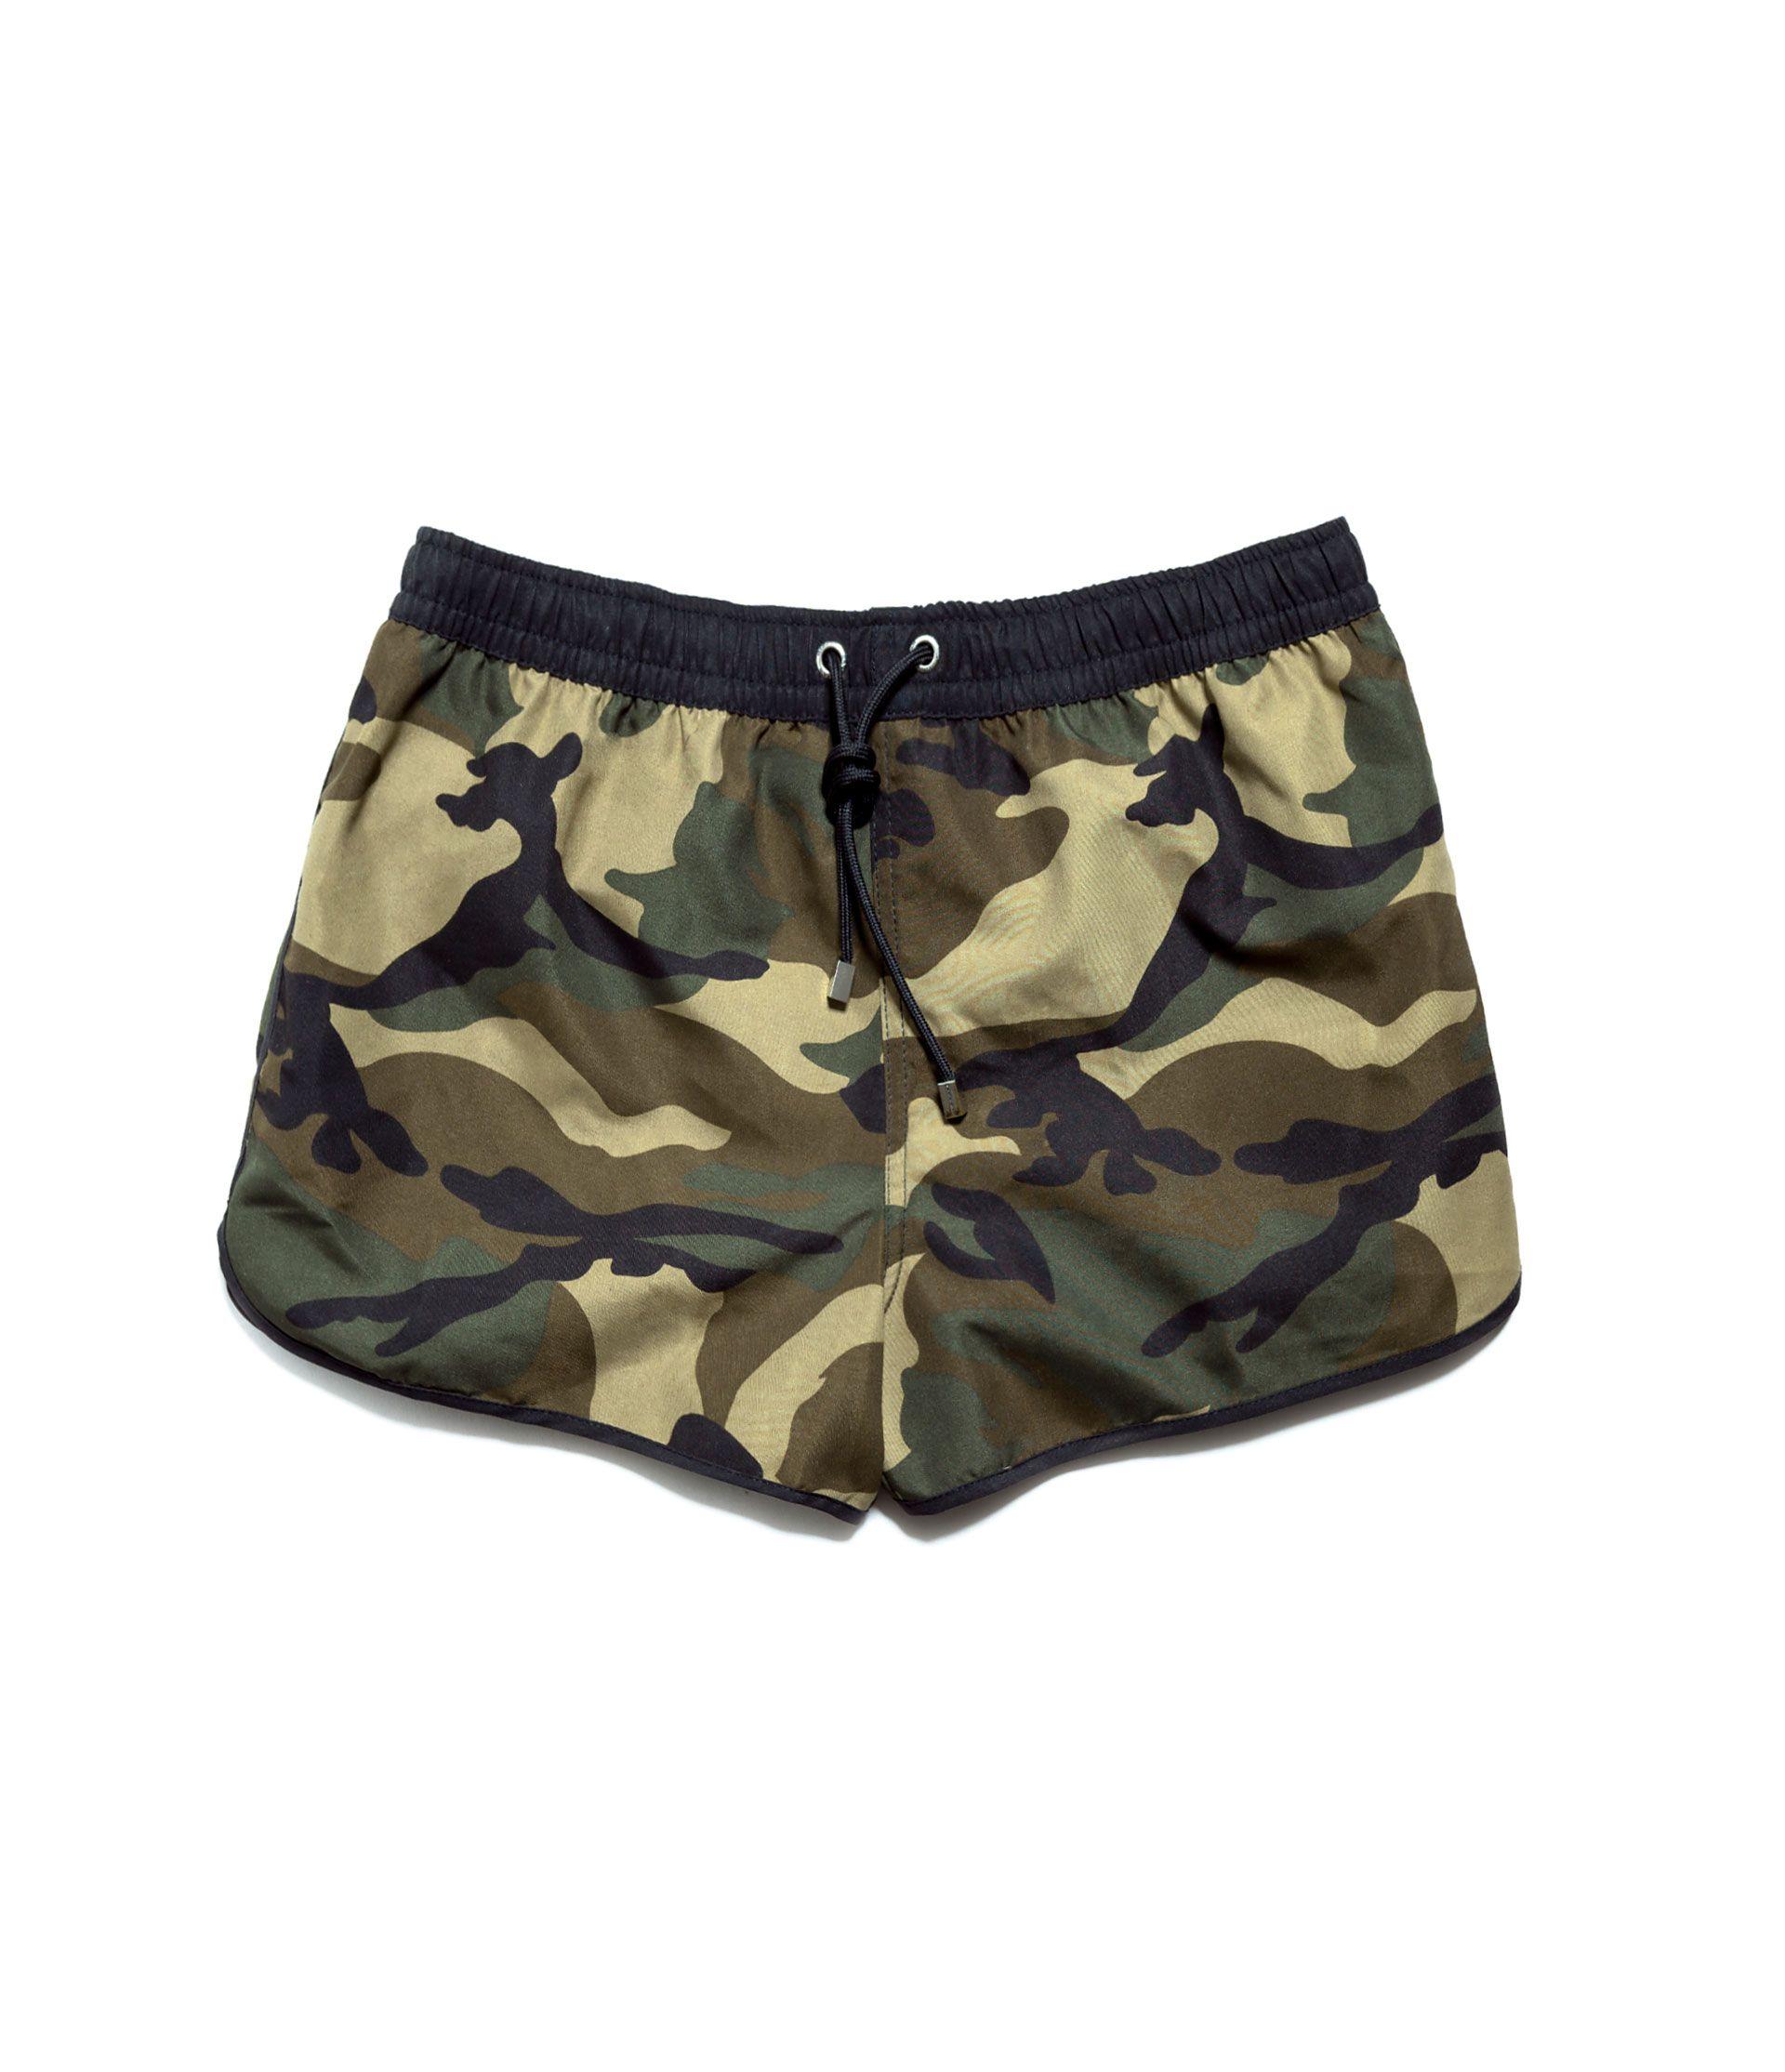 CAMOUFLAGE SWIM SHORTS - Swimwear - Man - ZARA United States ...